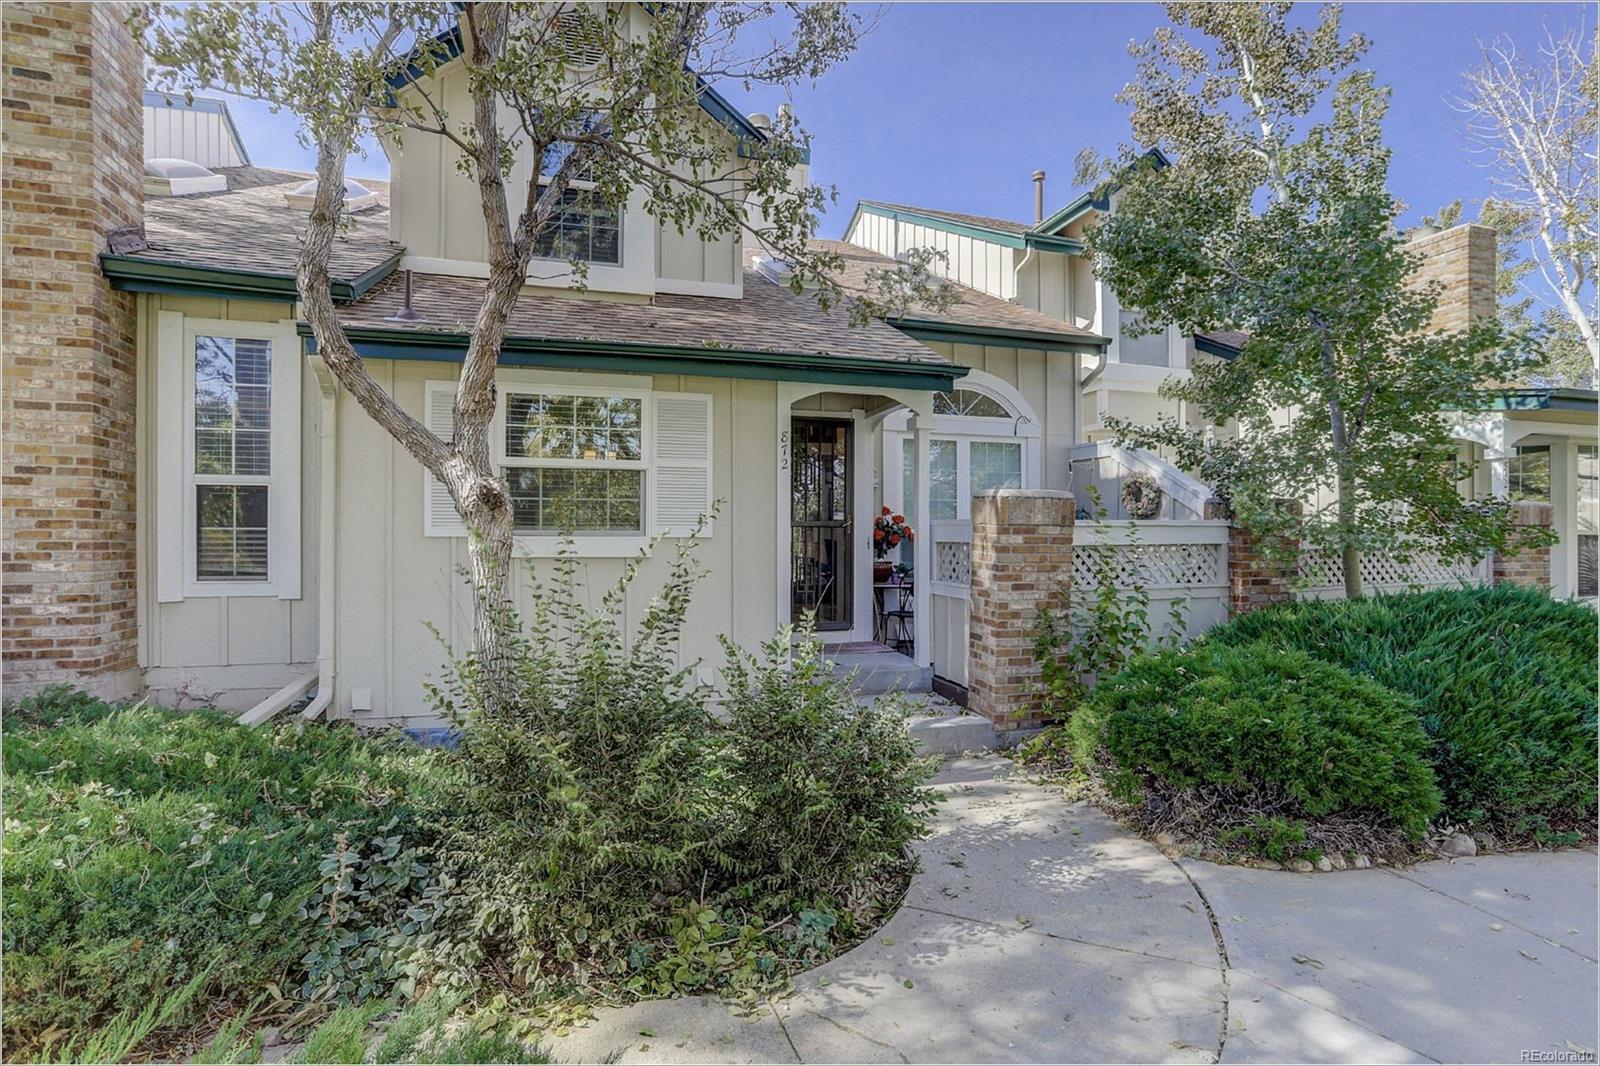 872 S Fairplay Street, Aurora, CO 80012 - Aurora, CO real estate listing